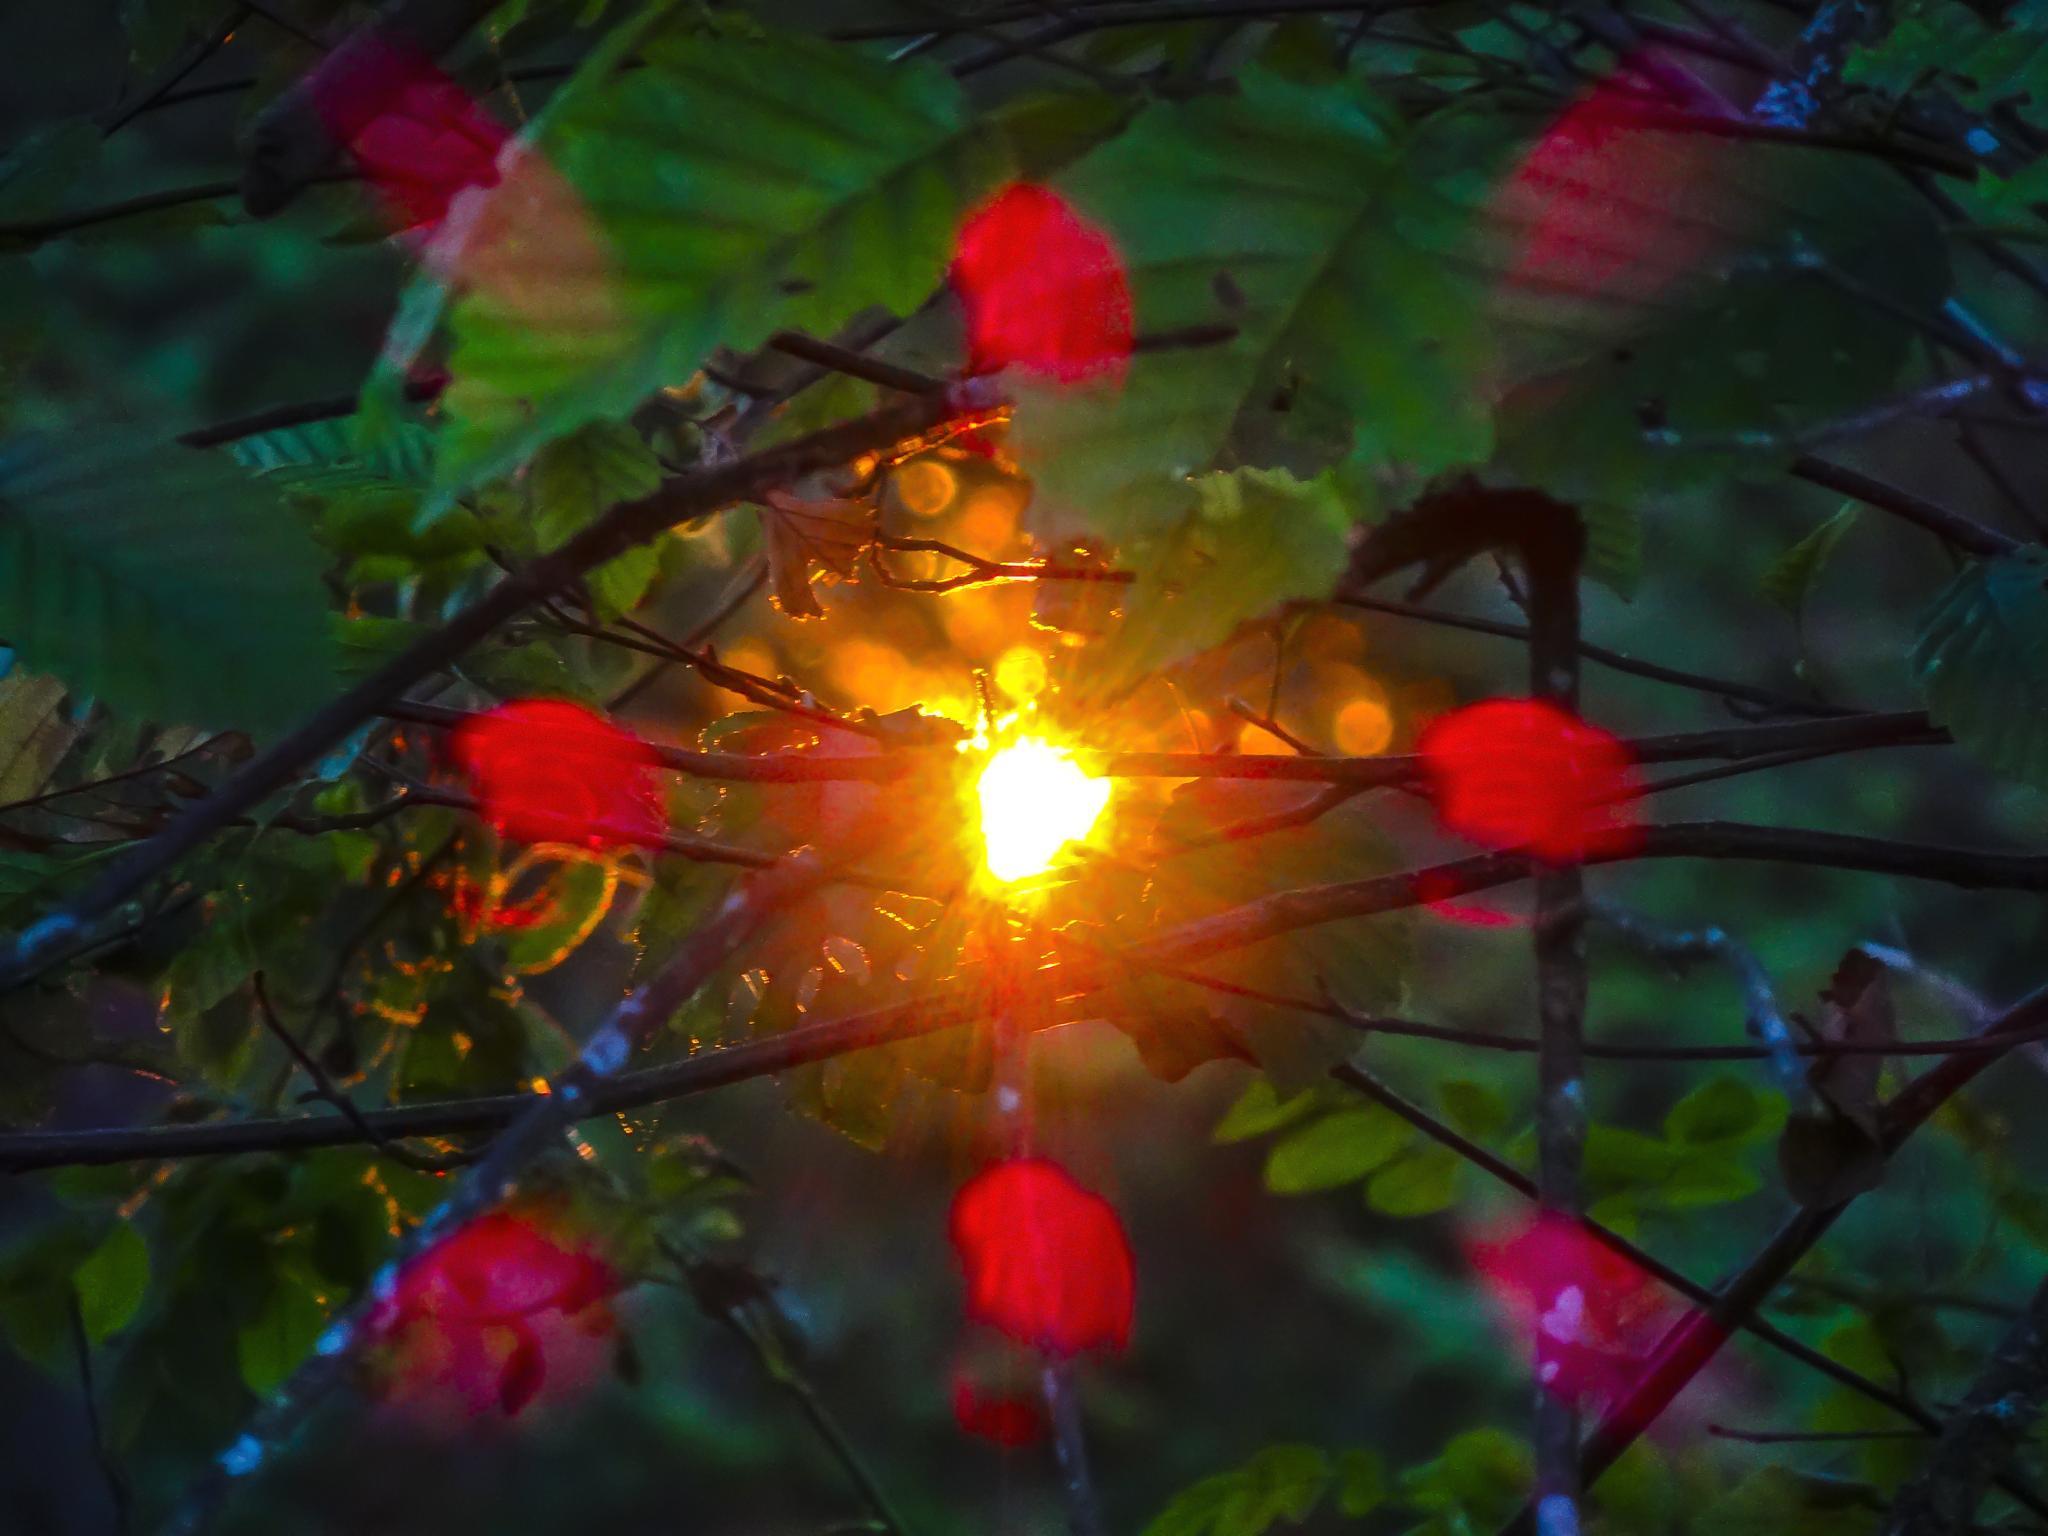 Sunset by Raini Sicher